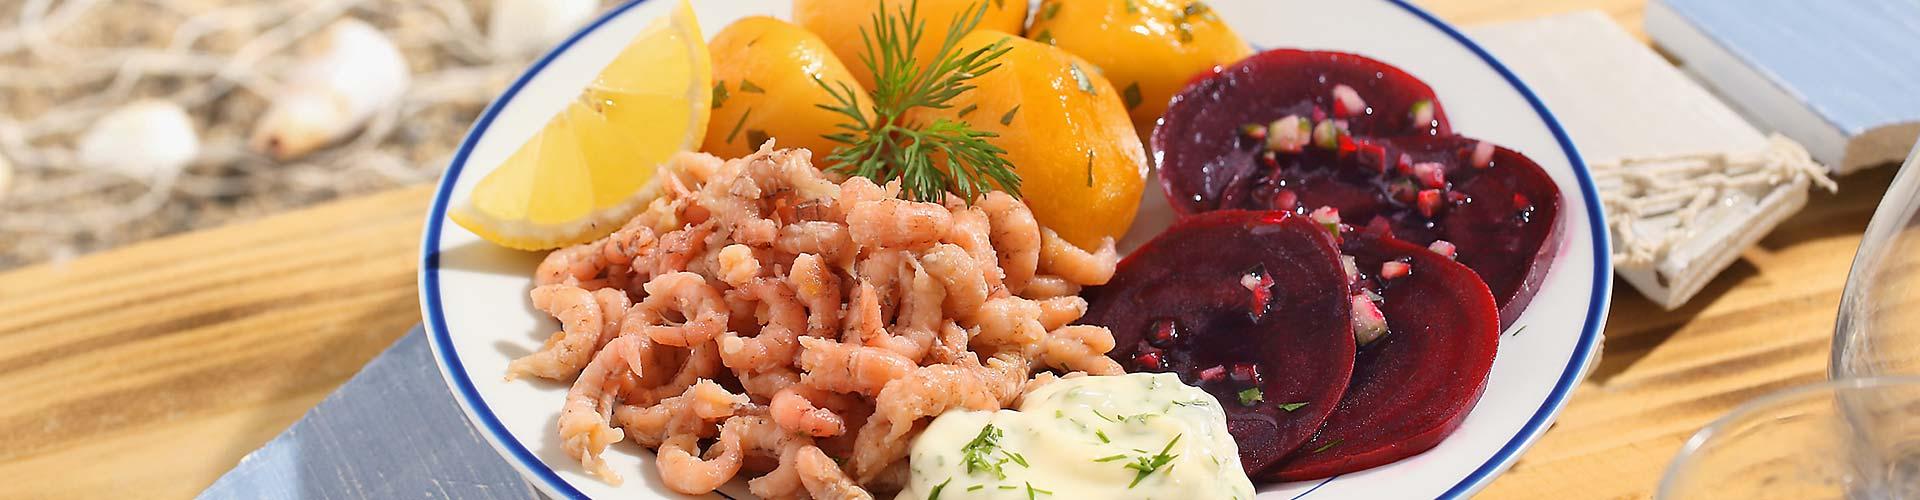 Die Gastronomie im Winter in Carolinensiel-Harlesiel